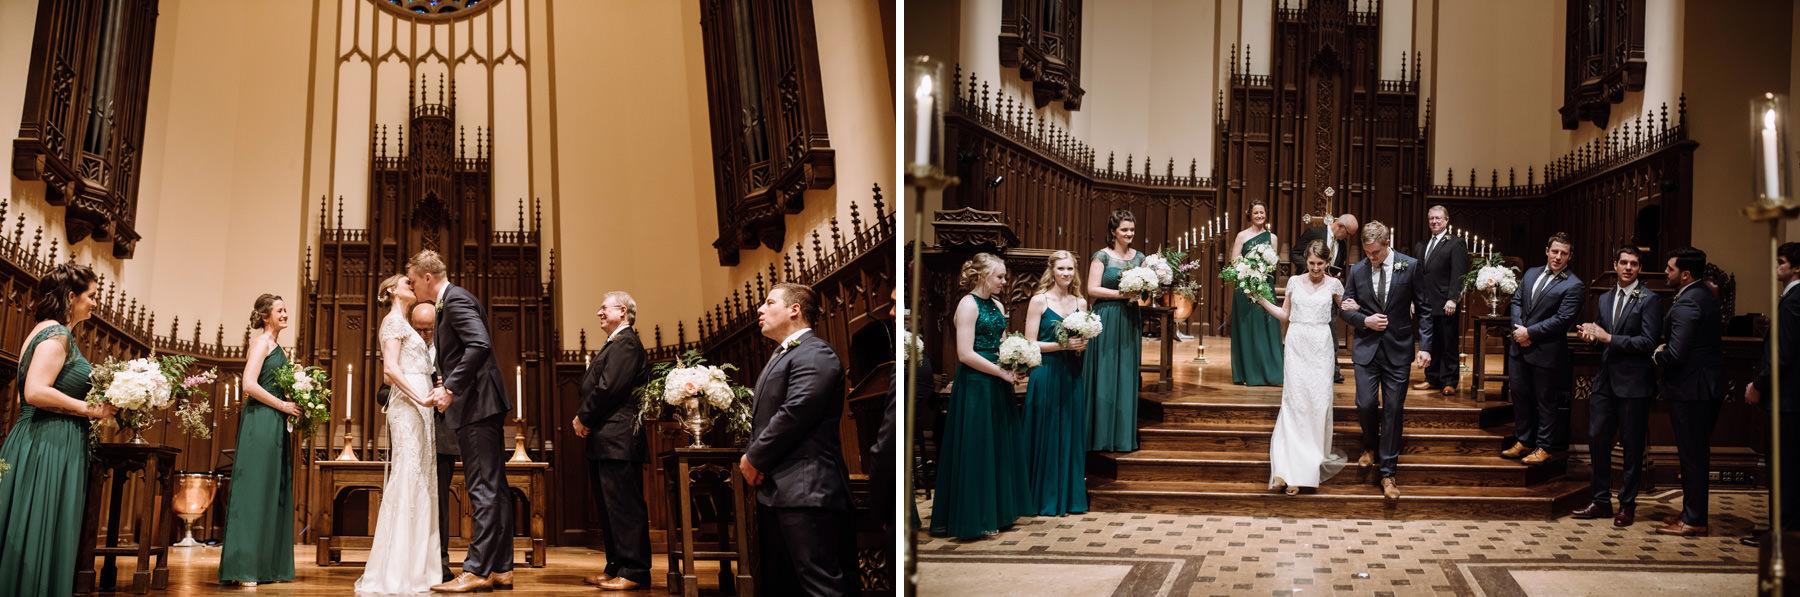 Memorial Presbyterian Wedding in St. Louis Missouri_Kindling Wedding Photography041.JPG